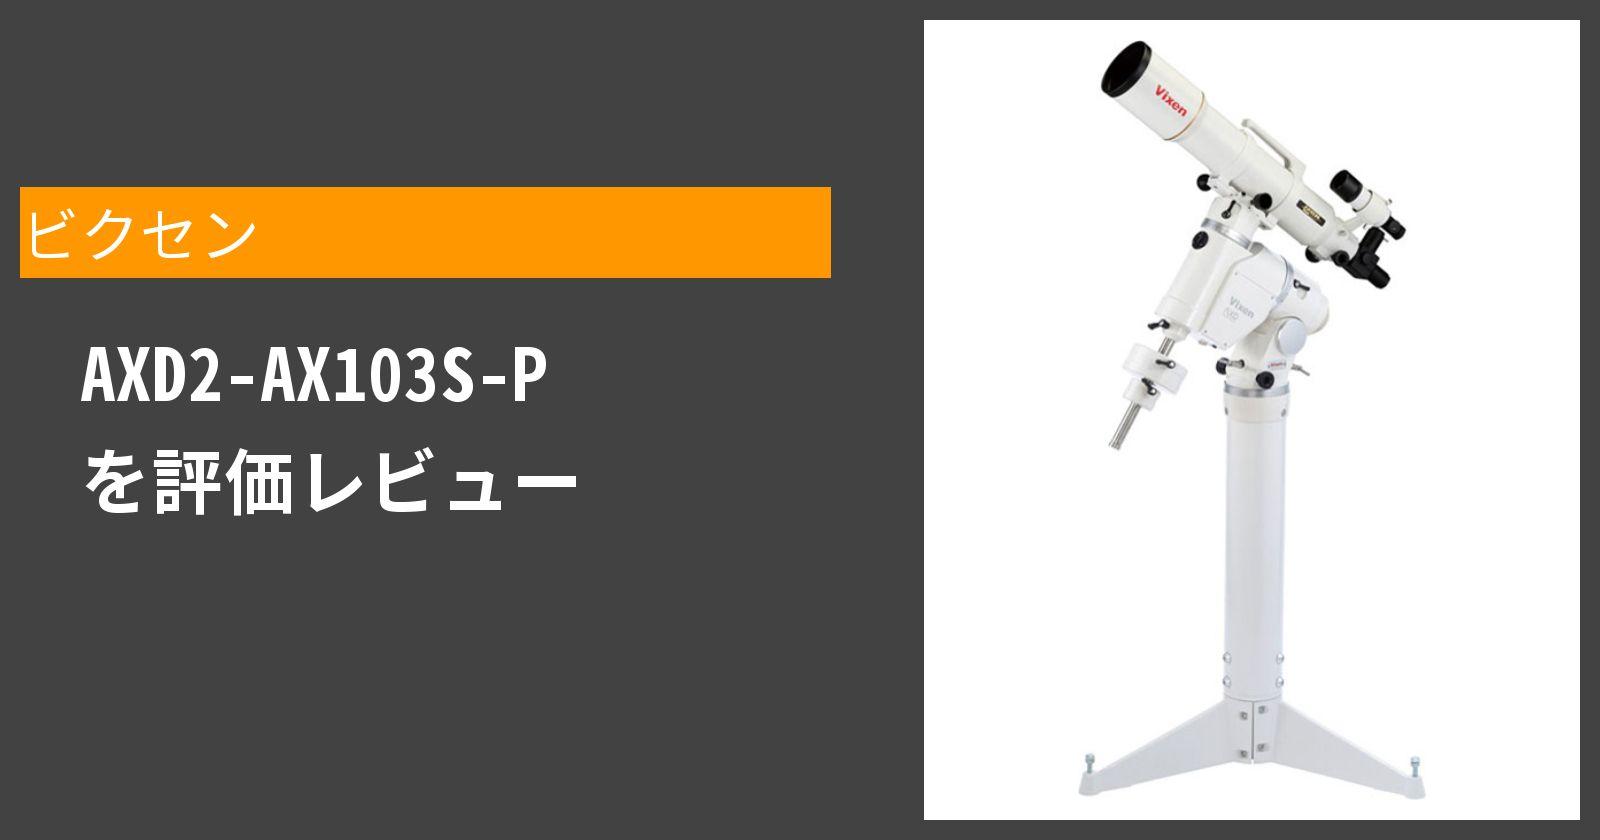 AXD2-AX103S-Pを徹底評価